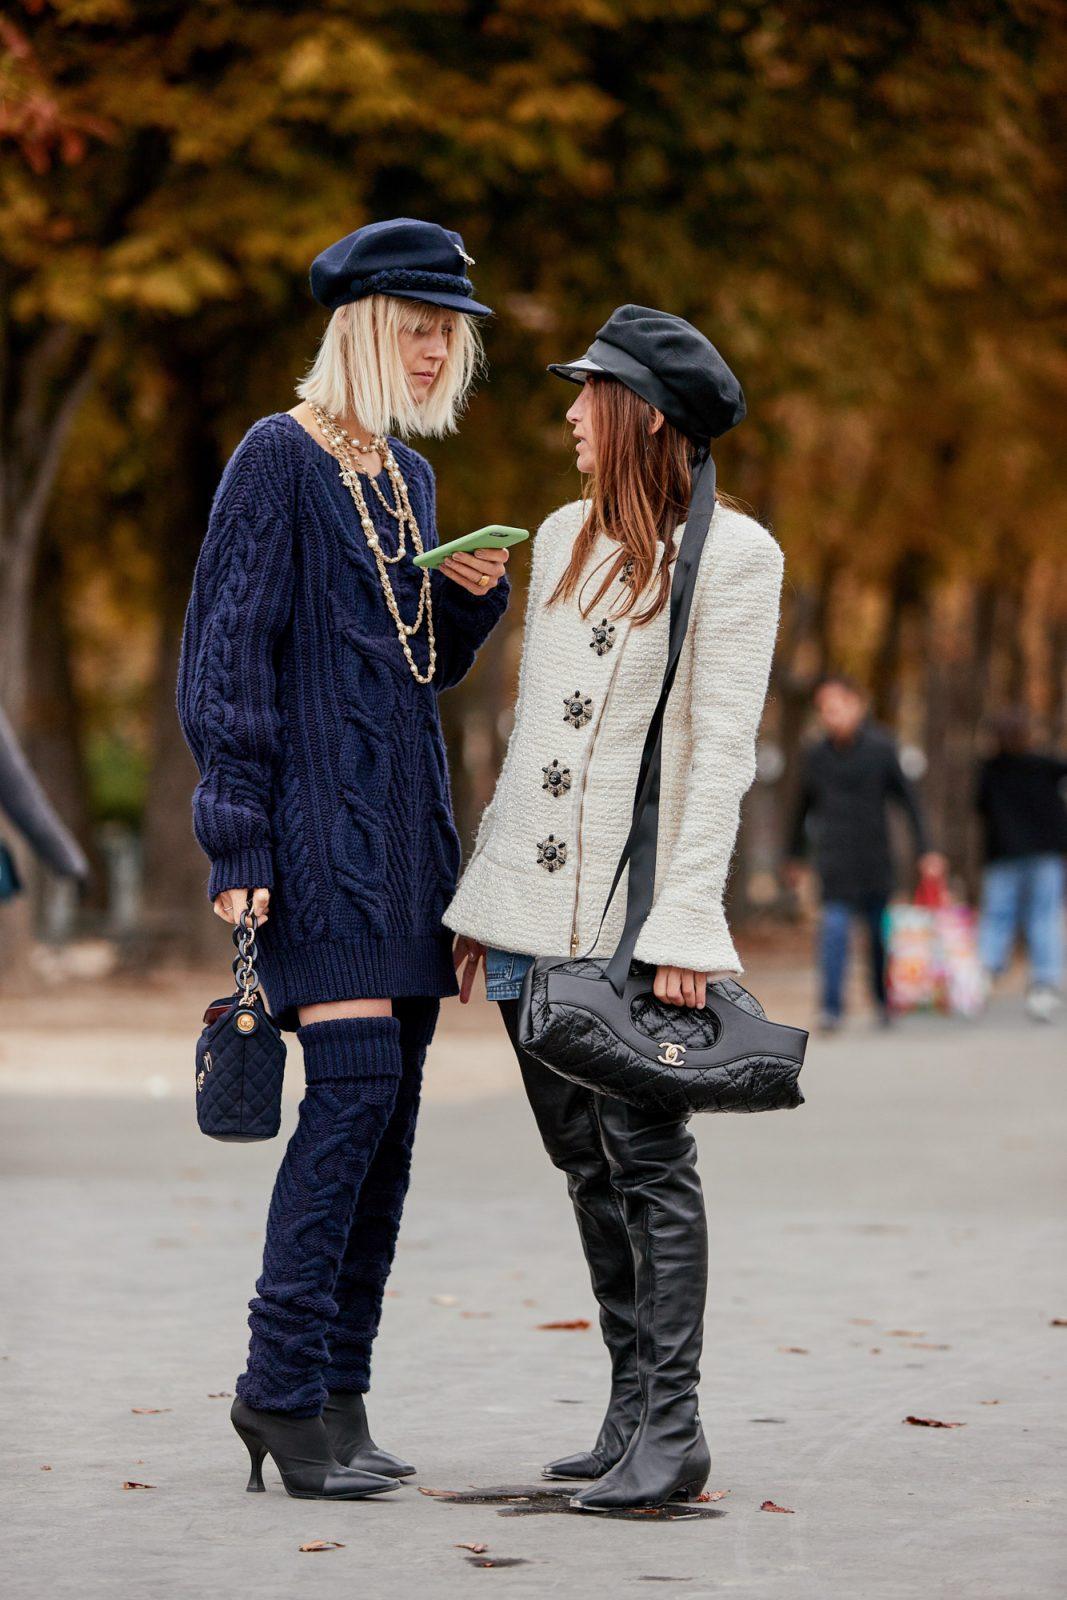 Paris fashions for winter